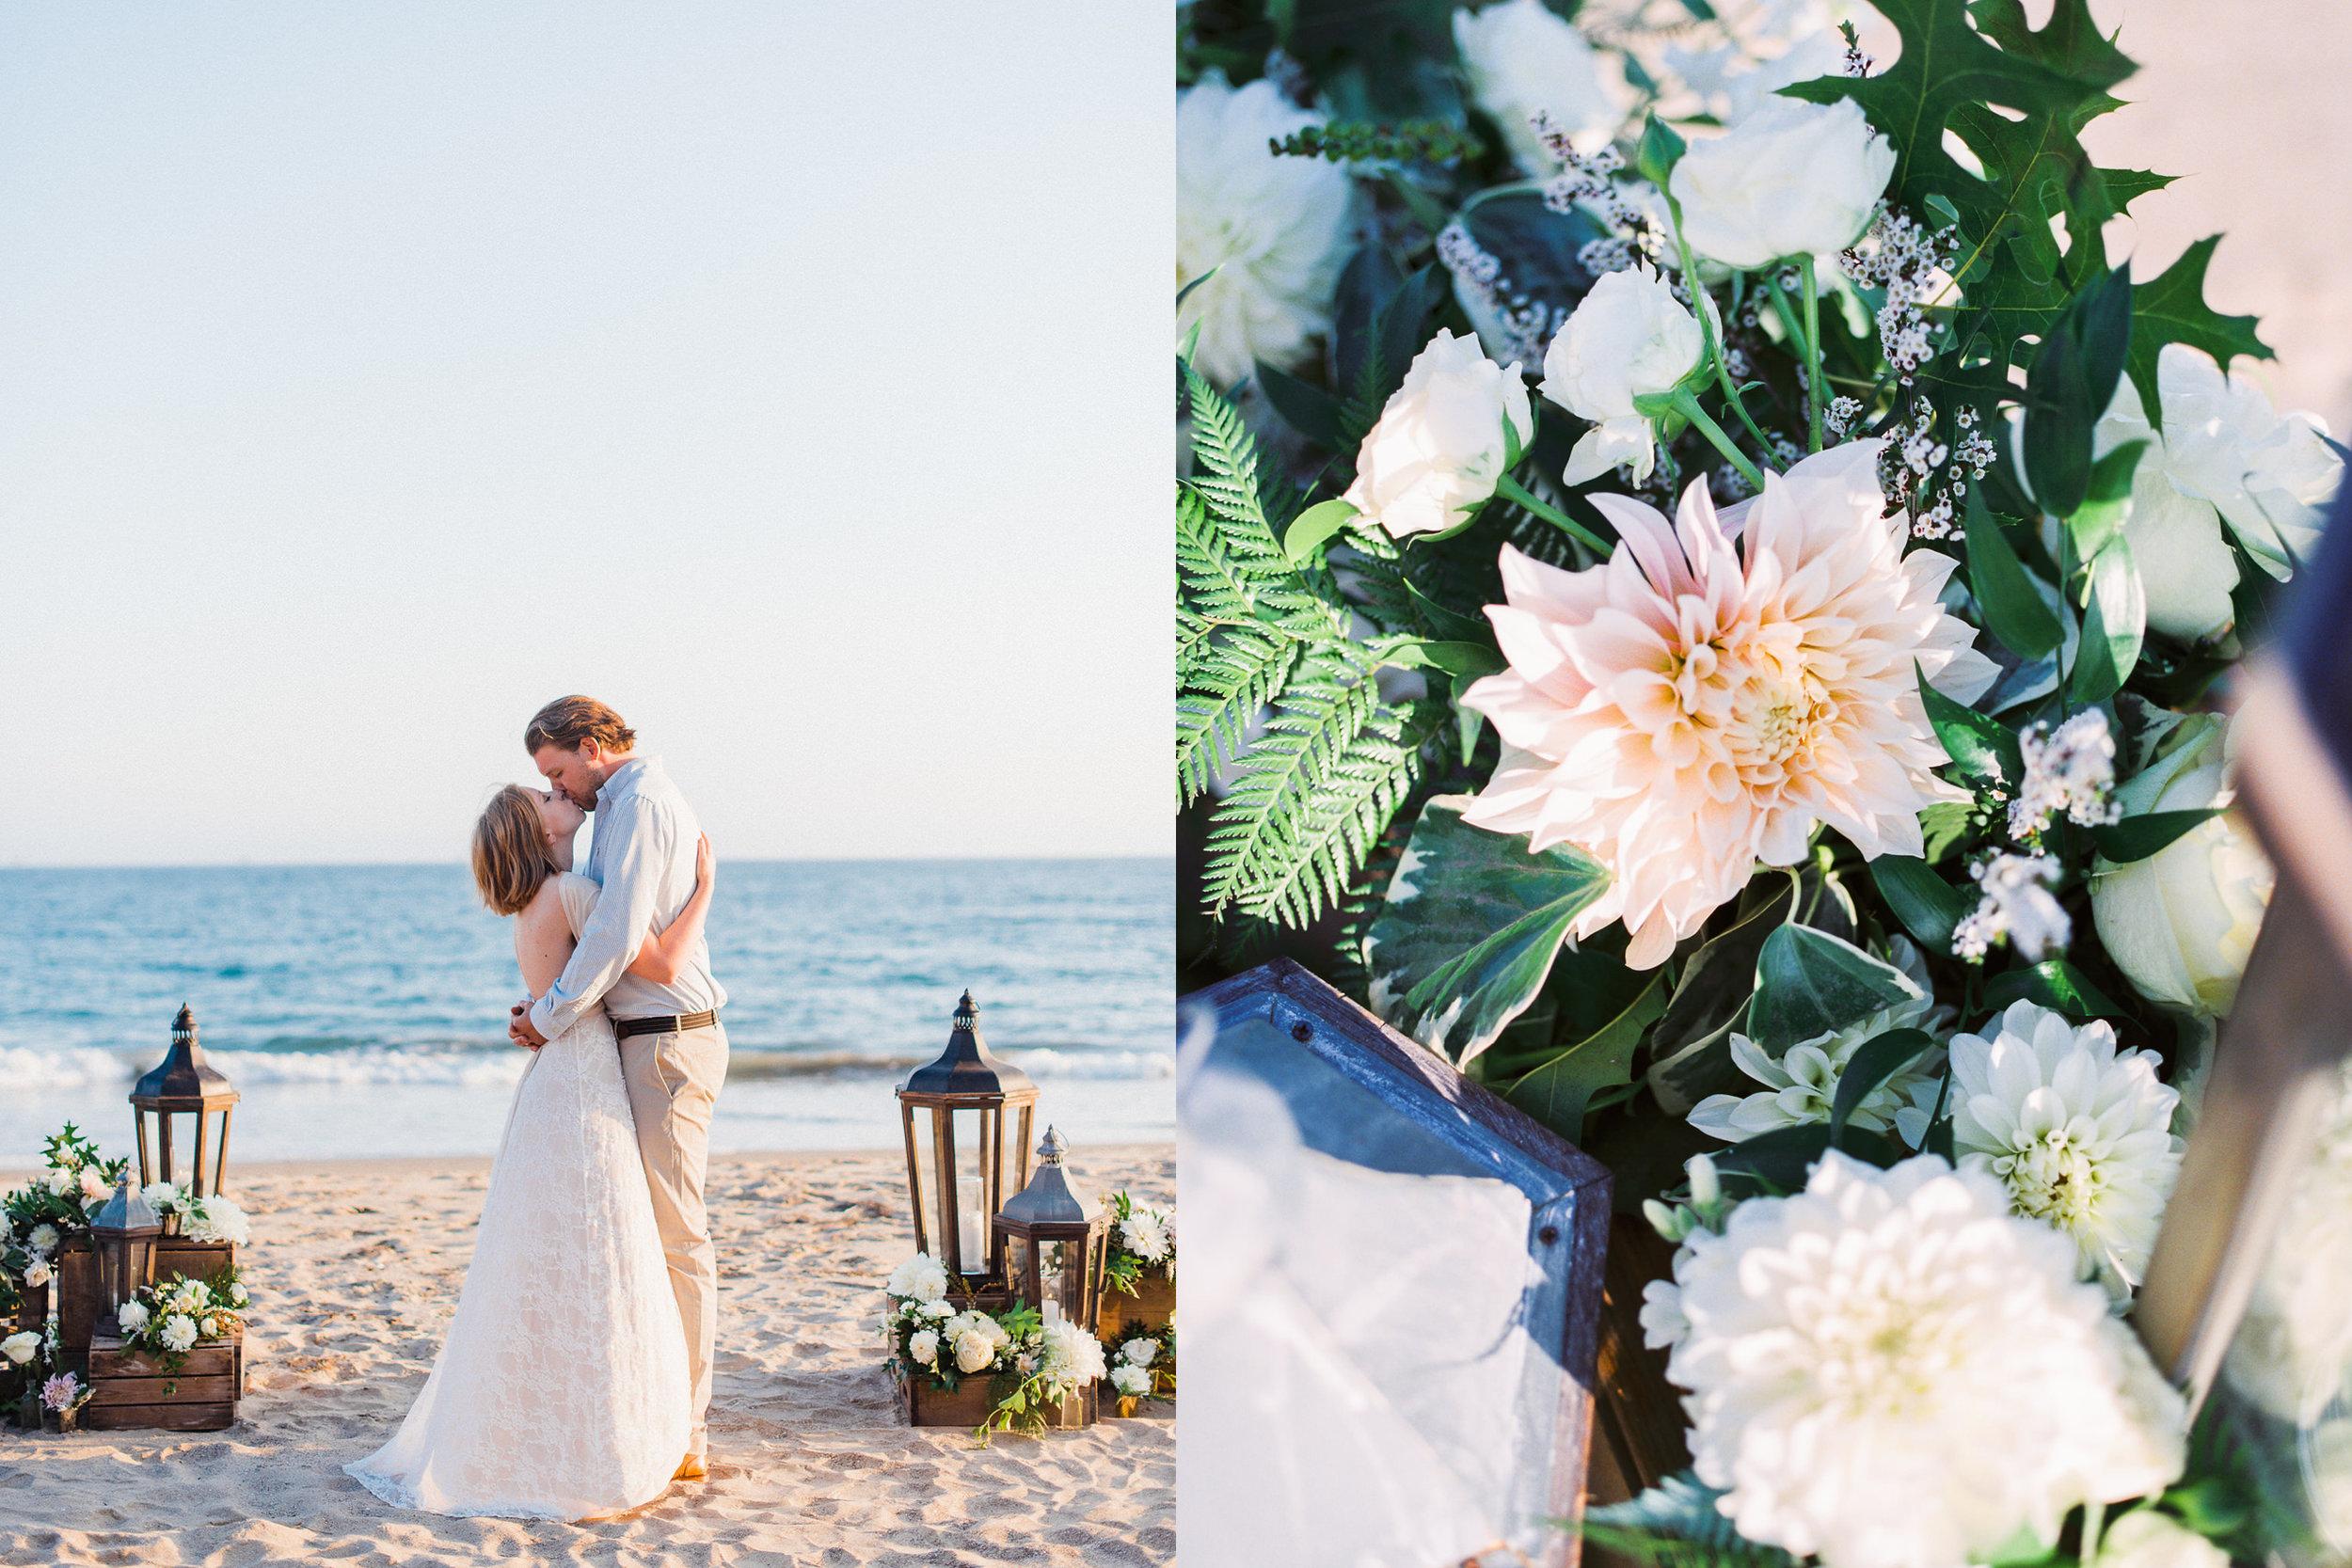 santa-barbara-elopement-wedding-elope-planner-event-design-coordinator-day-of-intimate-small-beach-ocean-view-front-lantern-blush-driftwood-summerland (4).jpg